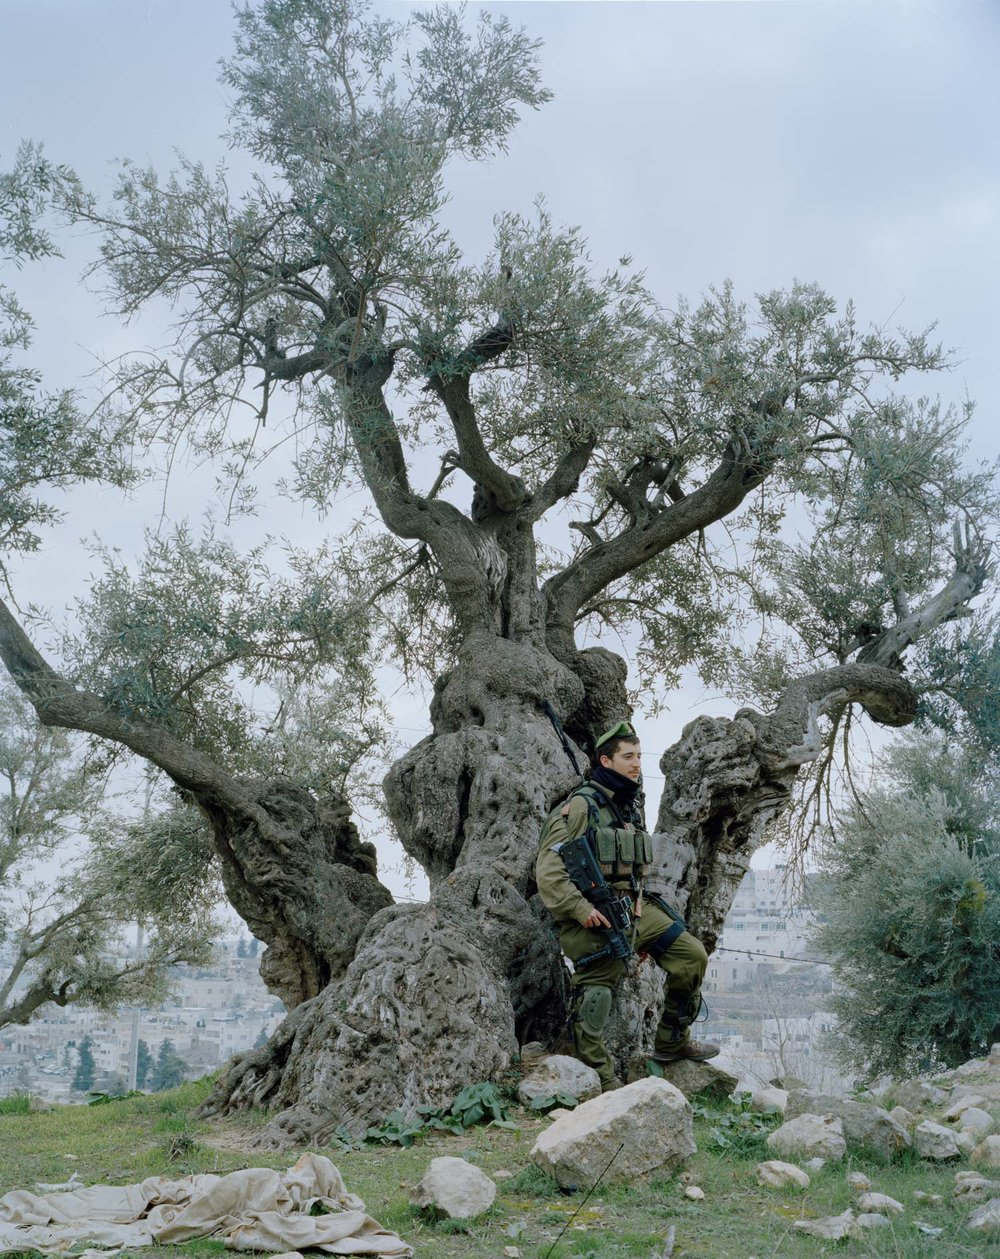 foto di Giulia Bianchi: Soldato Israeliano a Hebron, West Bank